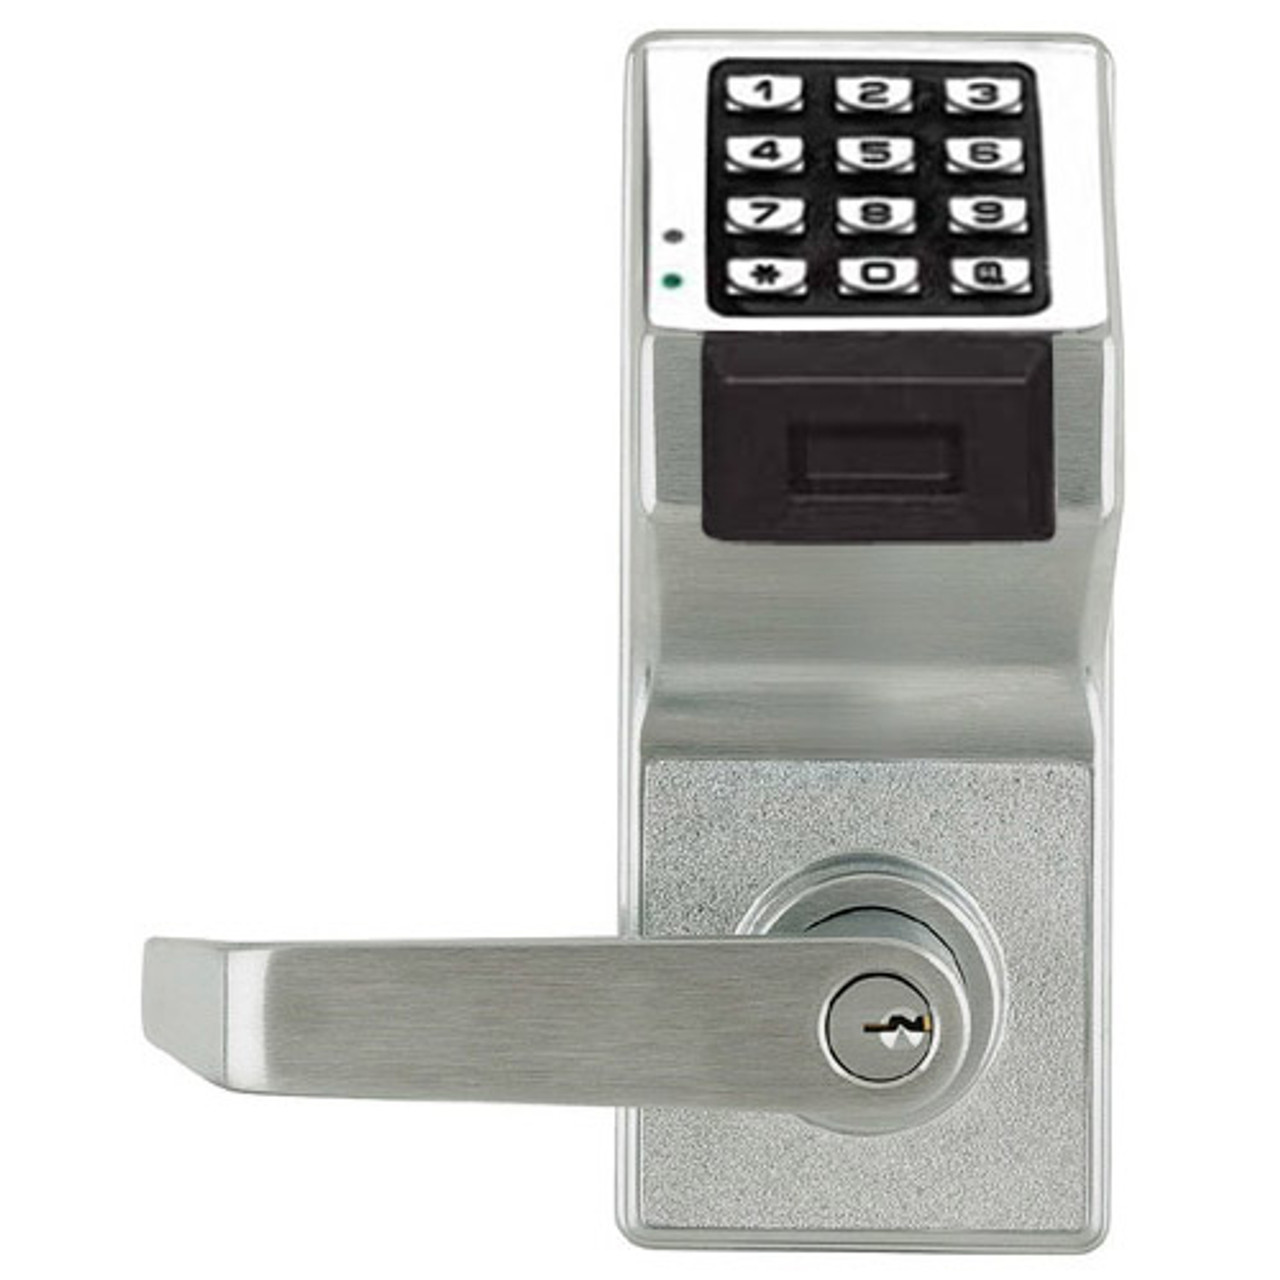 PDL6100-US26D Alarm Lock Trilogy Electronic Digital Lock in Satin Chrome Finish